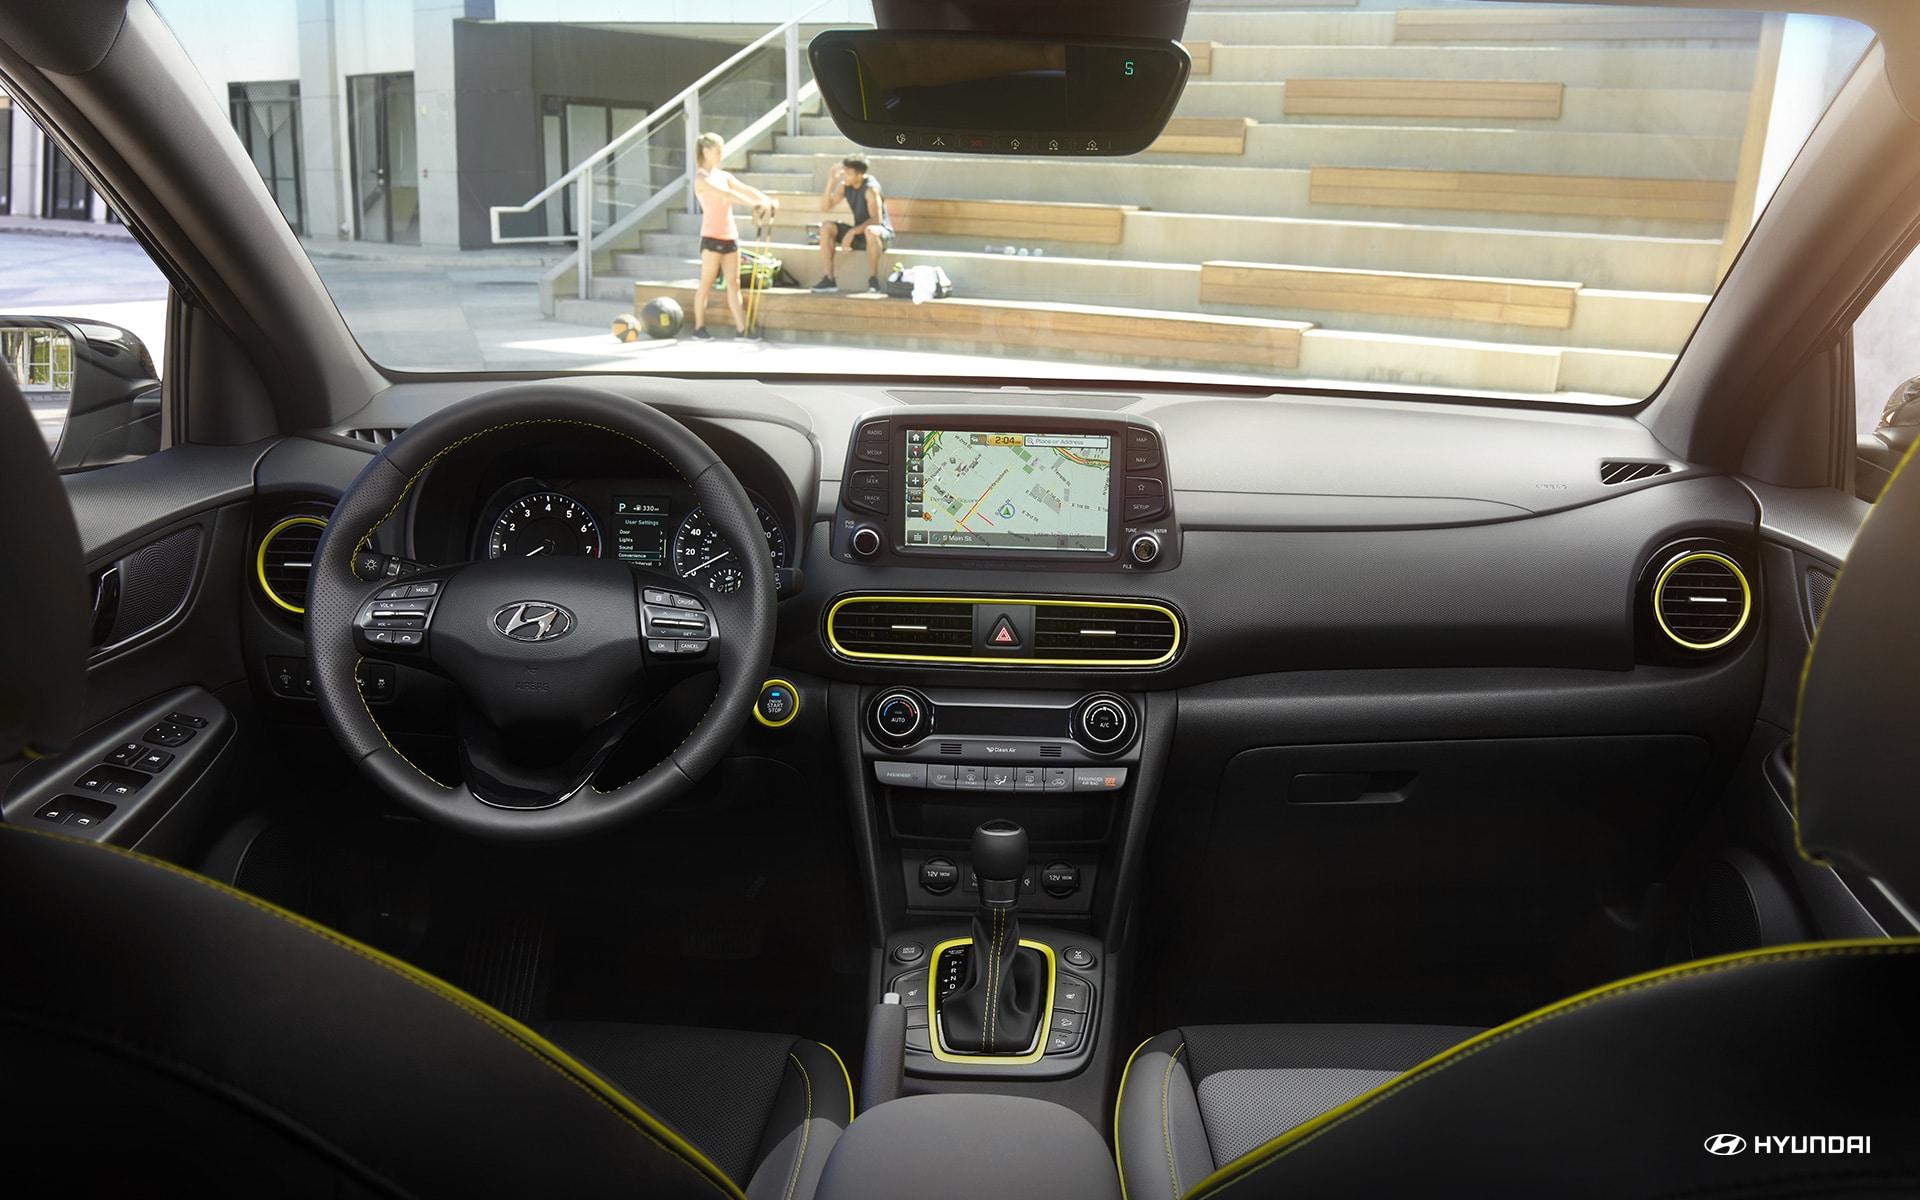 2019 Hyundai Kona Center Console